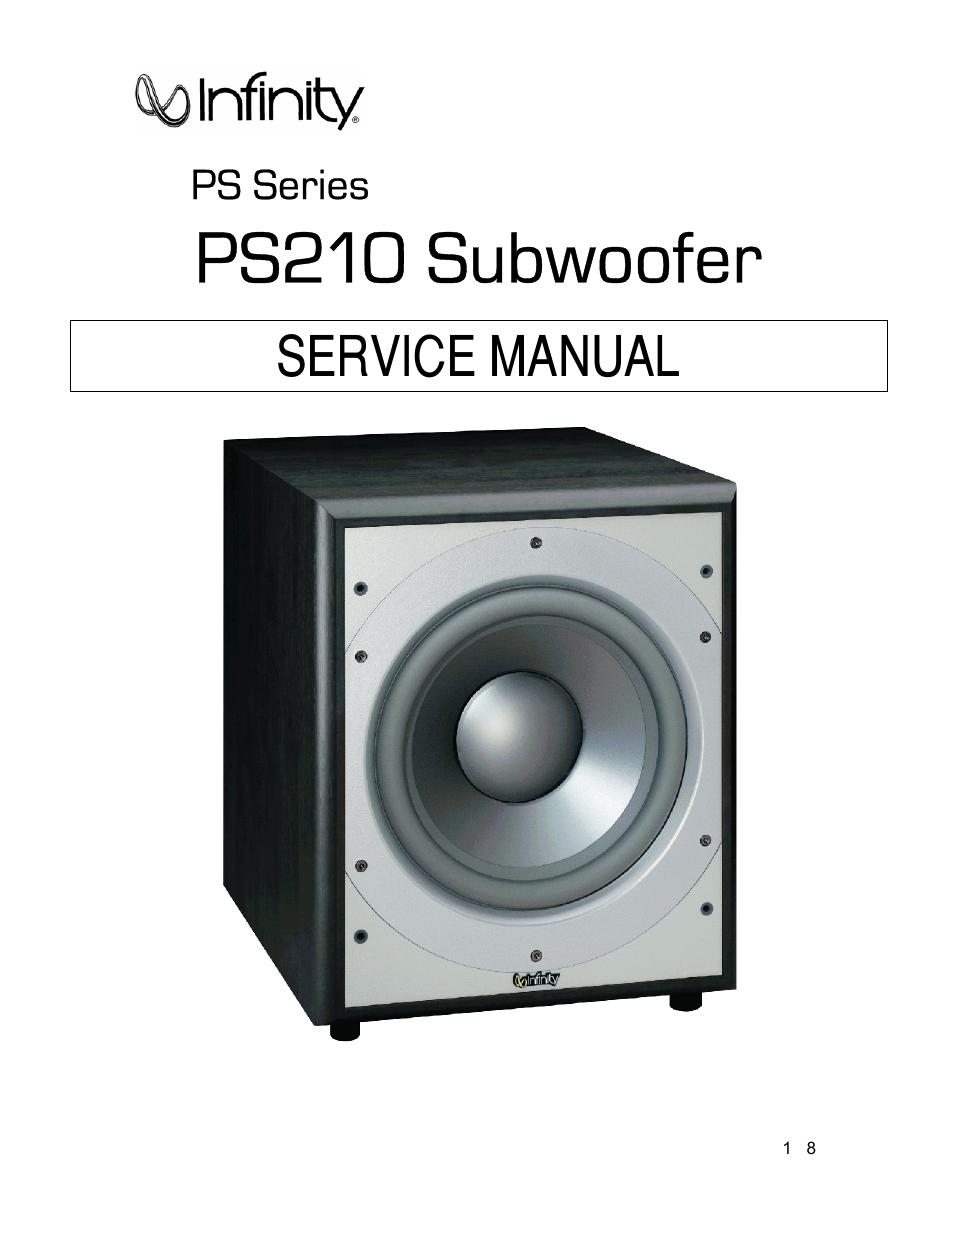 infinity ps210 user manual 19 pages user manual nikon d7200 user manual nikon d7100